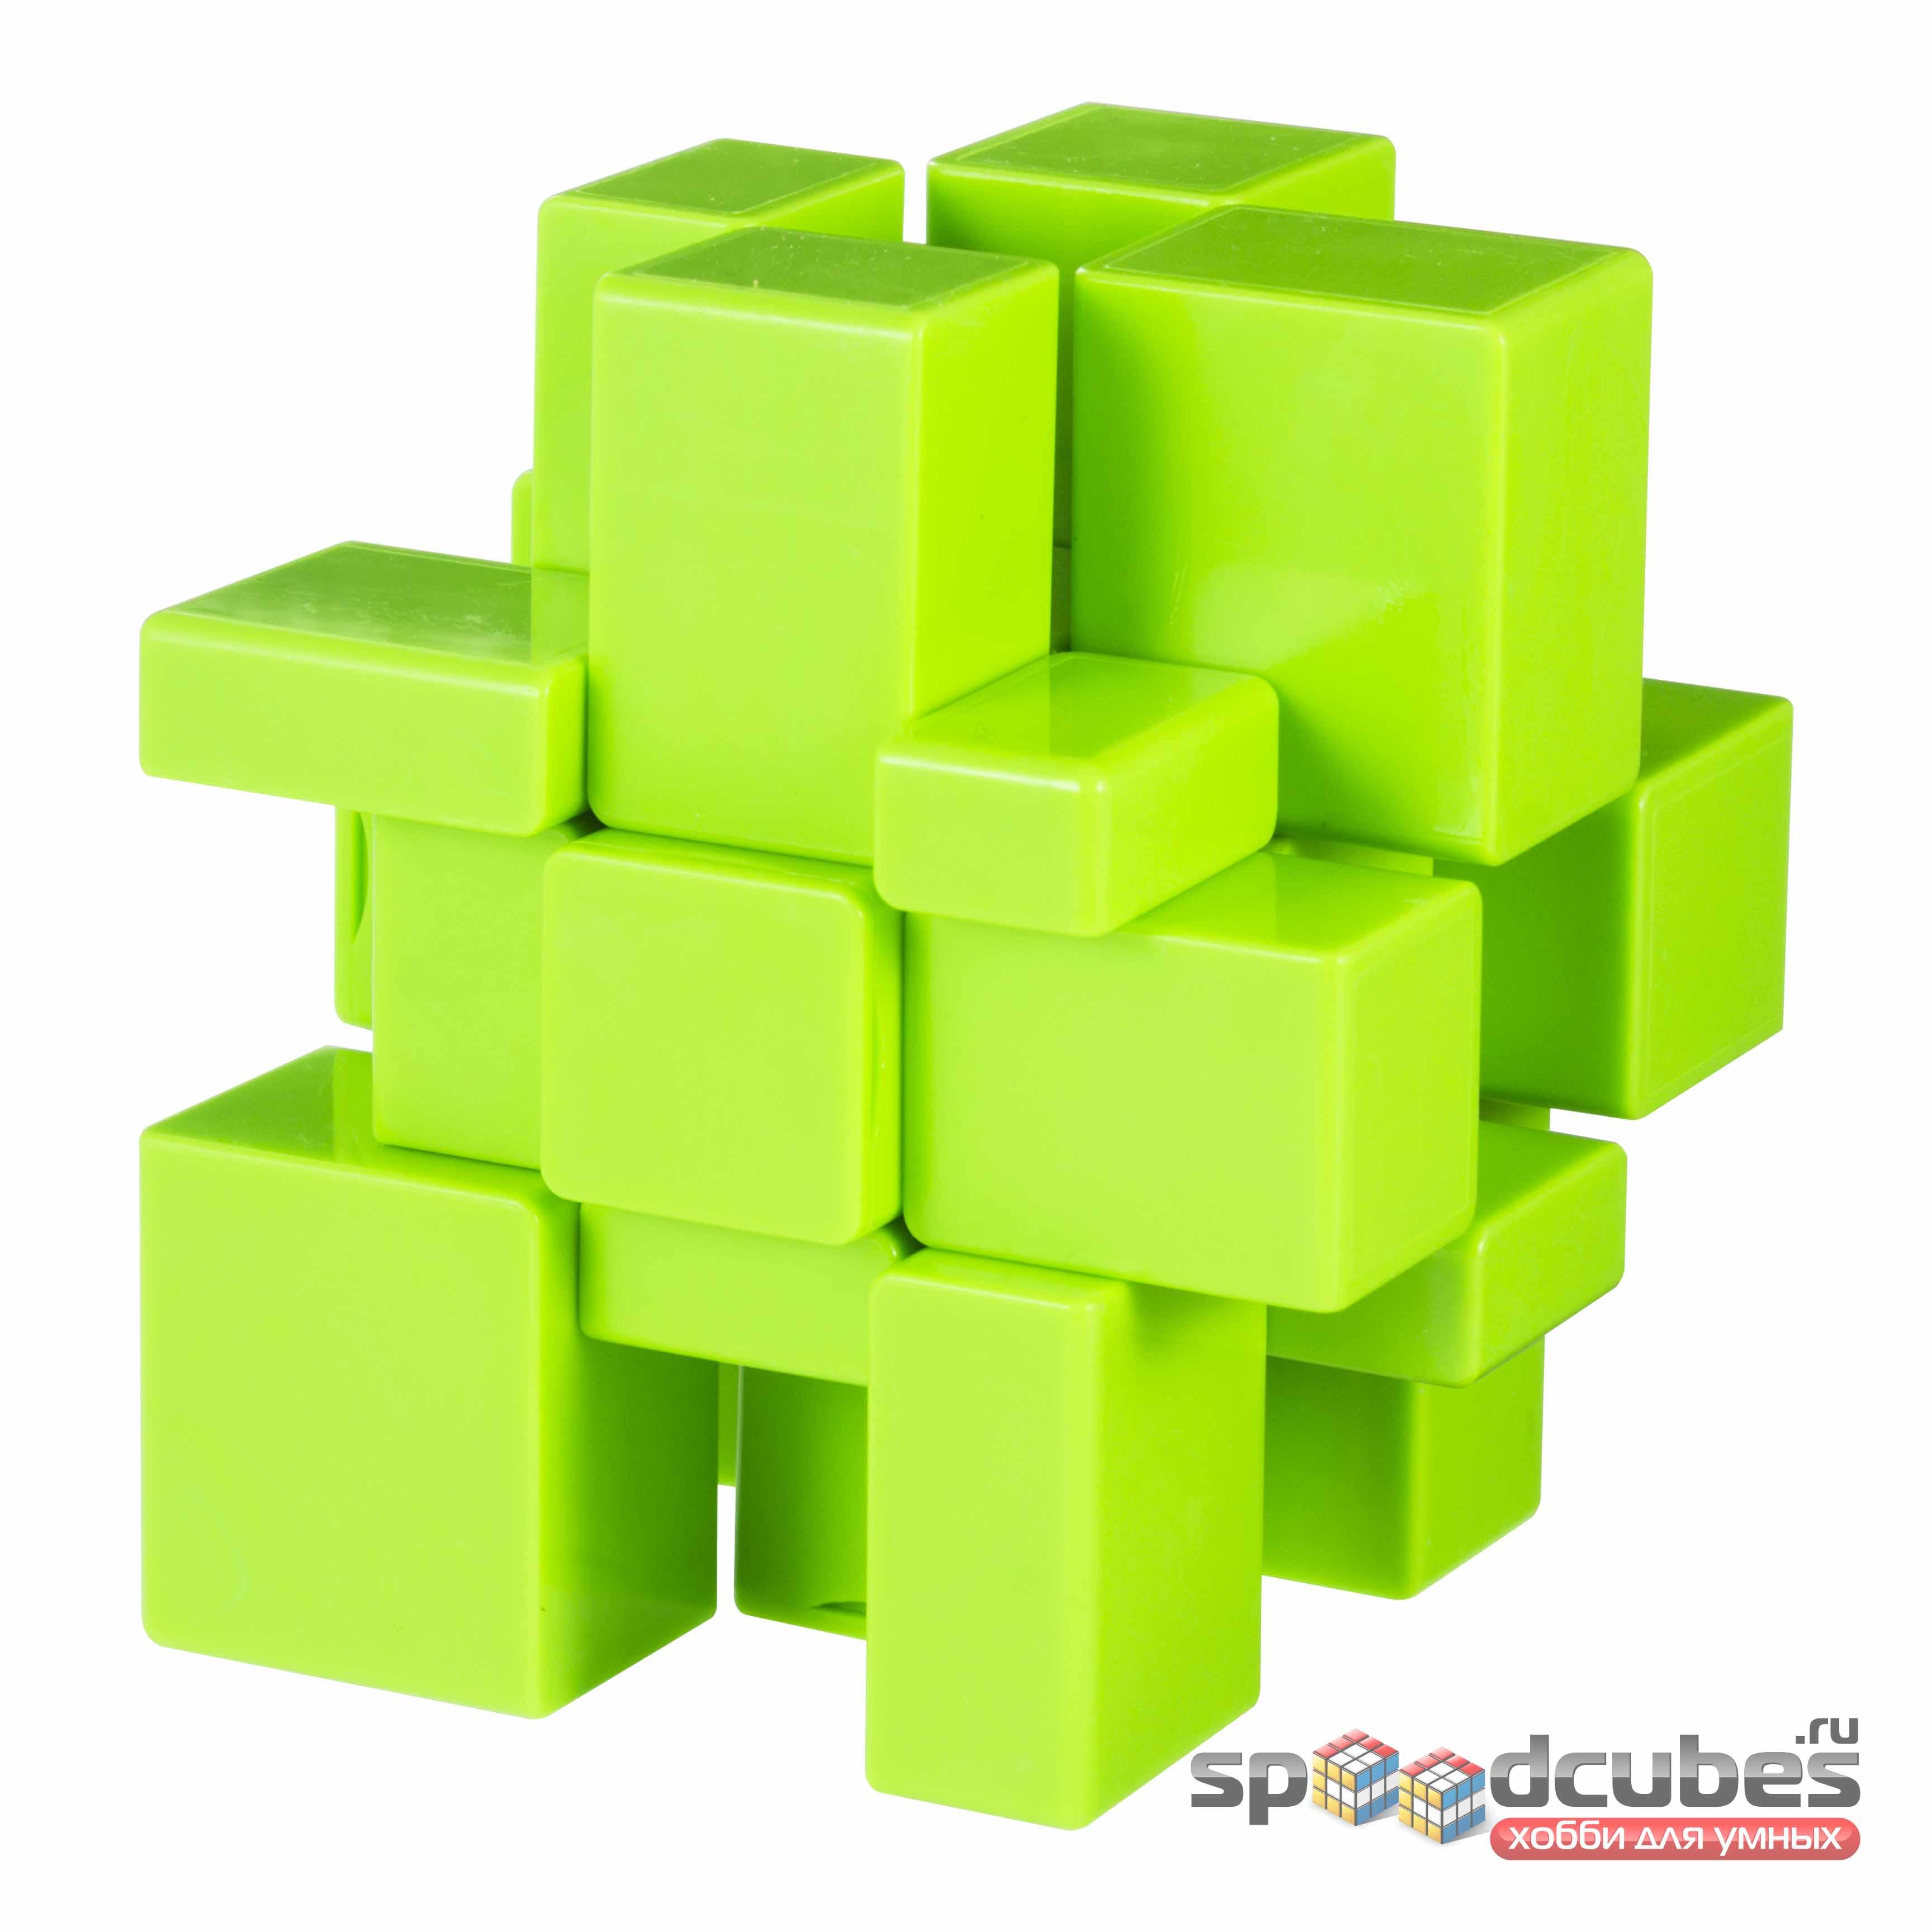 QiYi (MoFangGe) 3×3 Green Mirror Cube 3